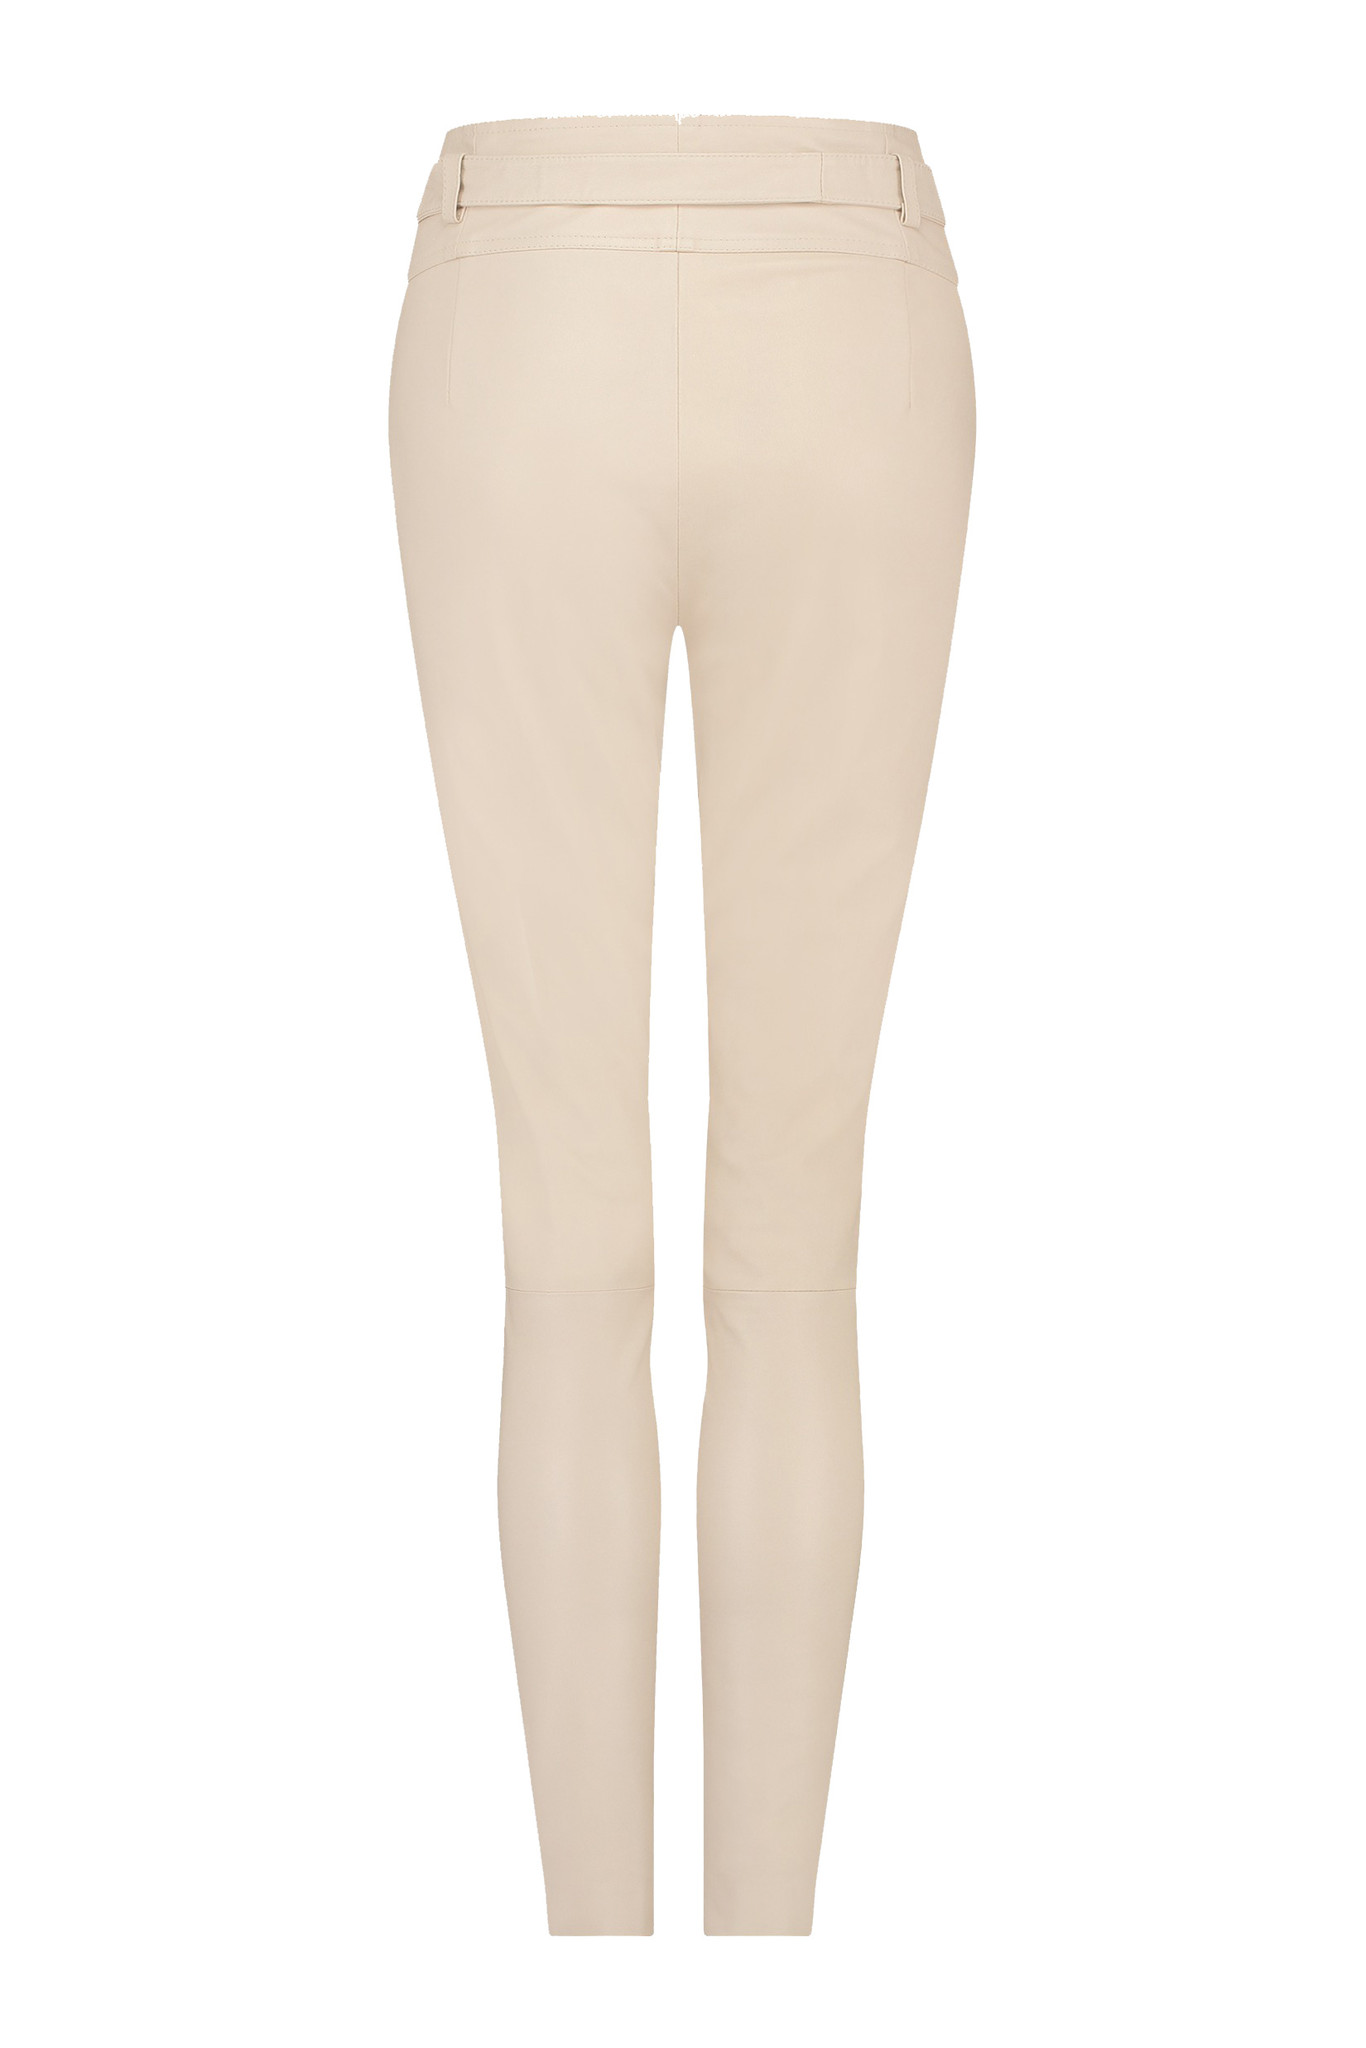 Ann Leather Pant - White Sand-2